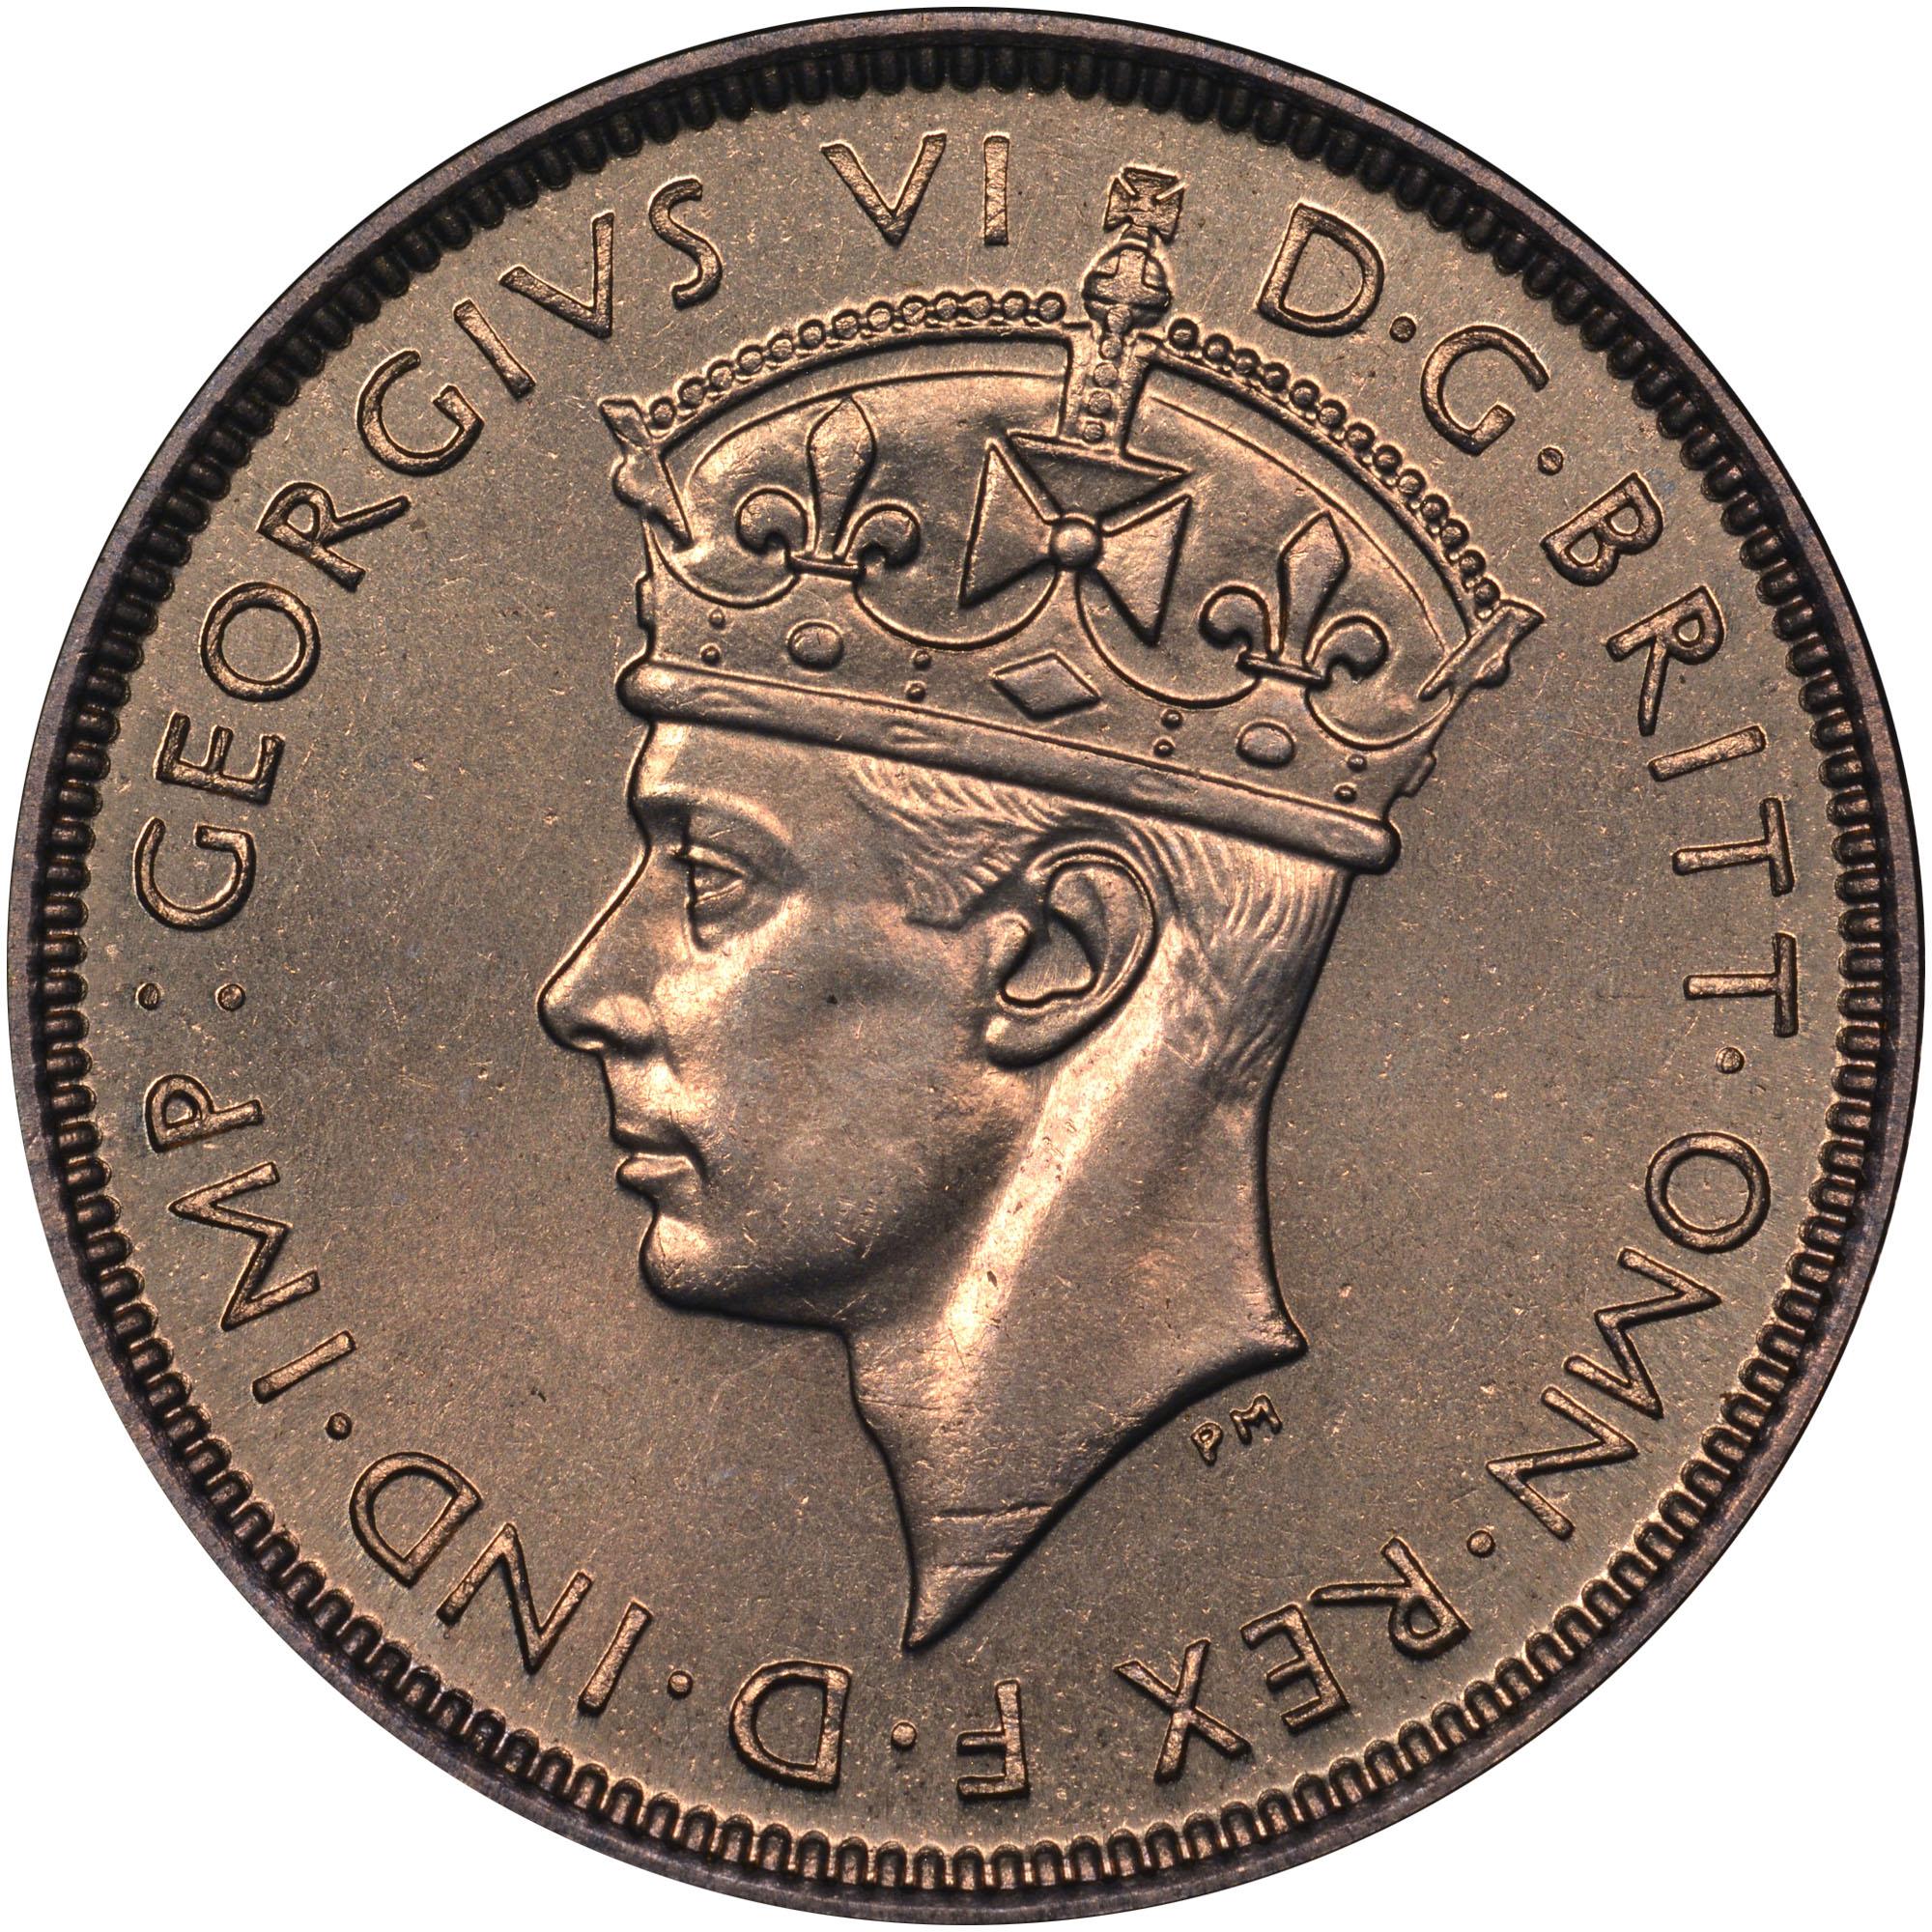 British West Africa 3 Pence obverse